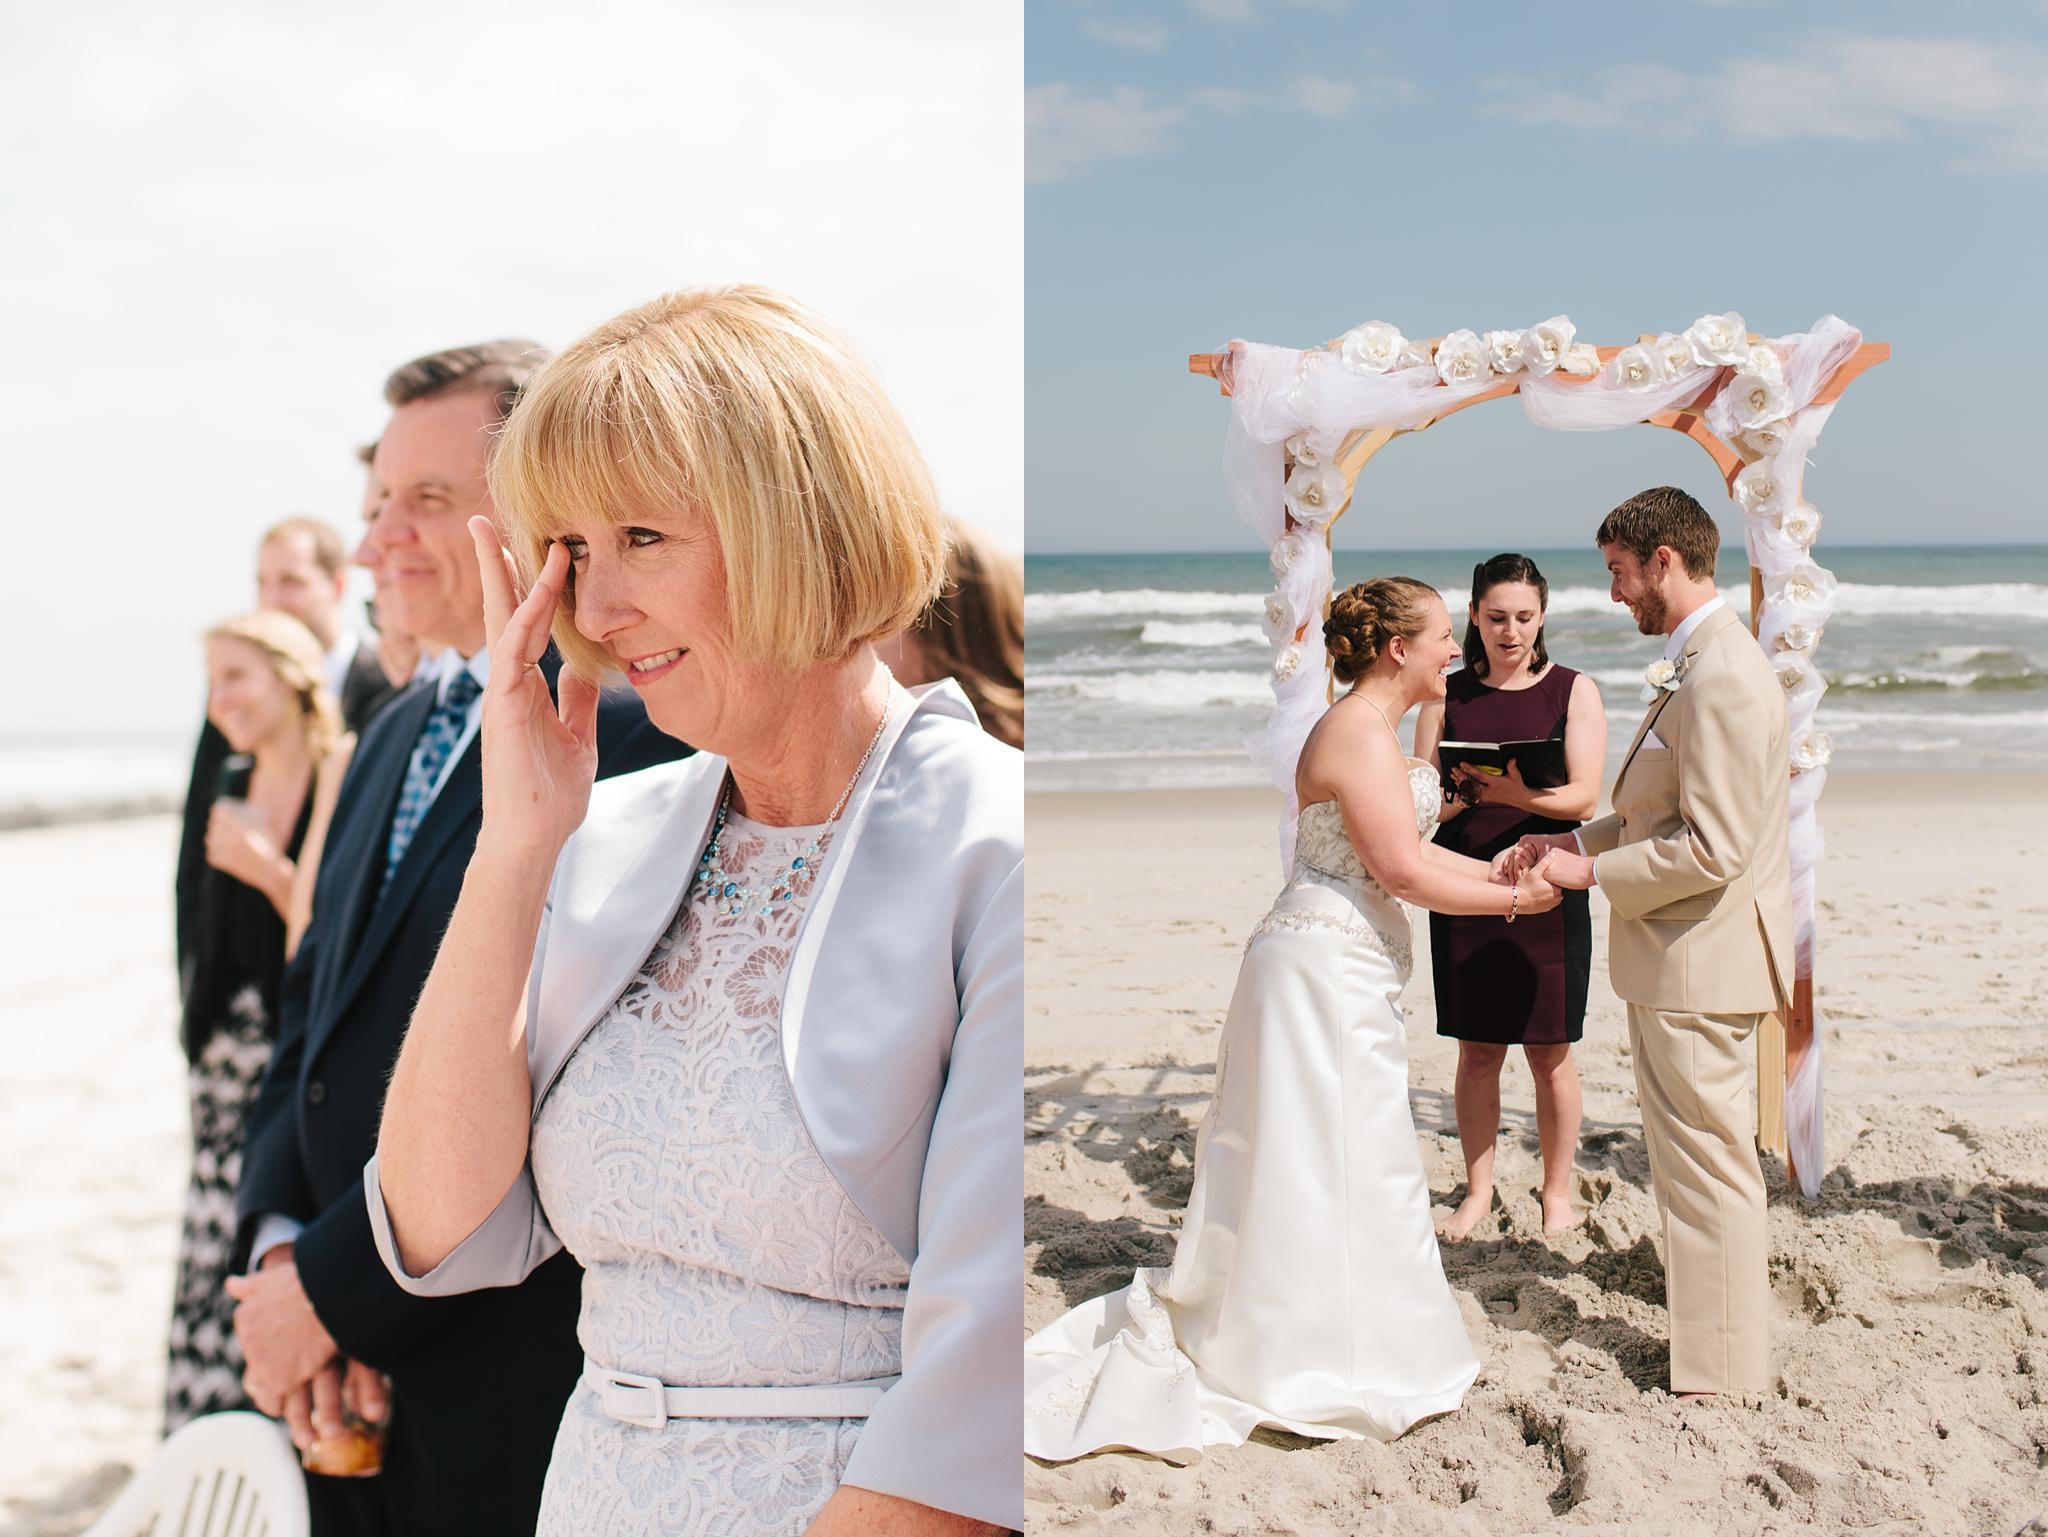 brant_beach_yacht_club_wedding_long_beach_island_nj_wedding_photographer_434.jpg